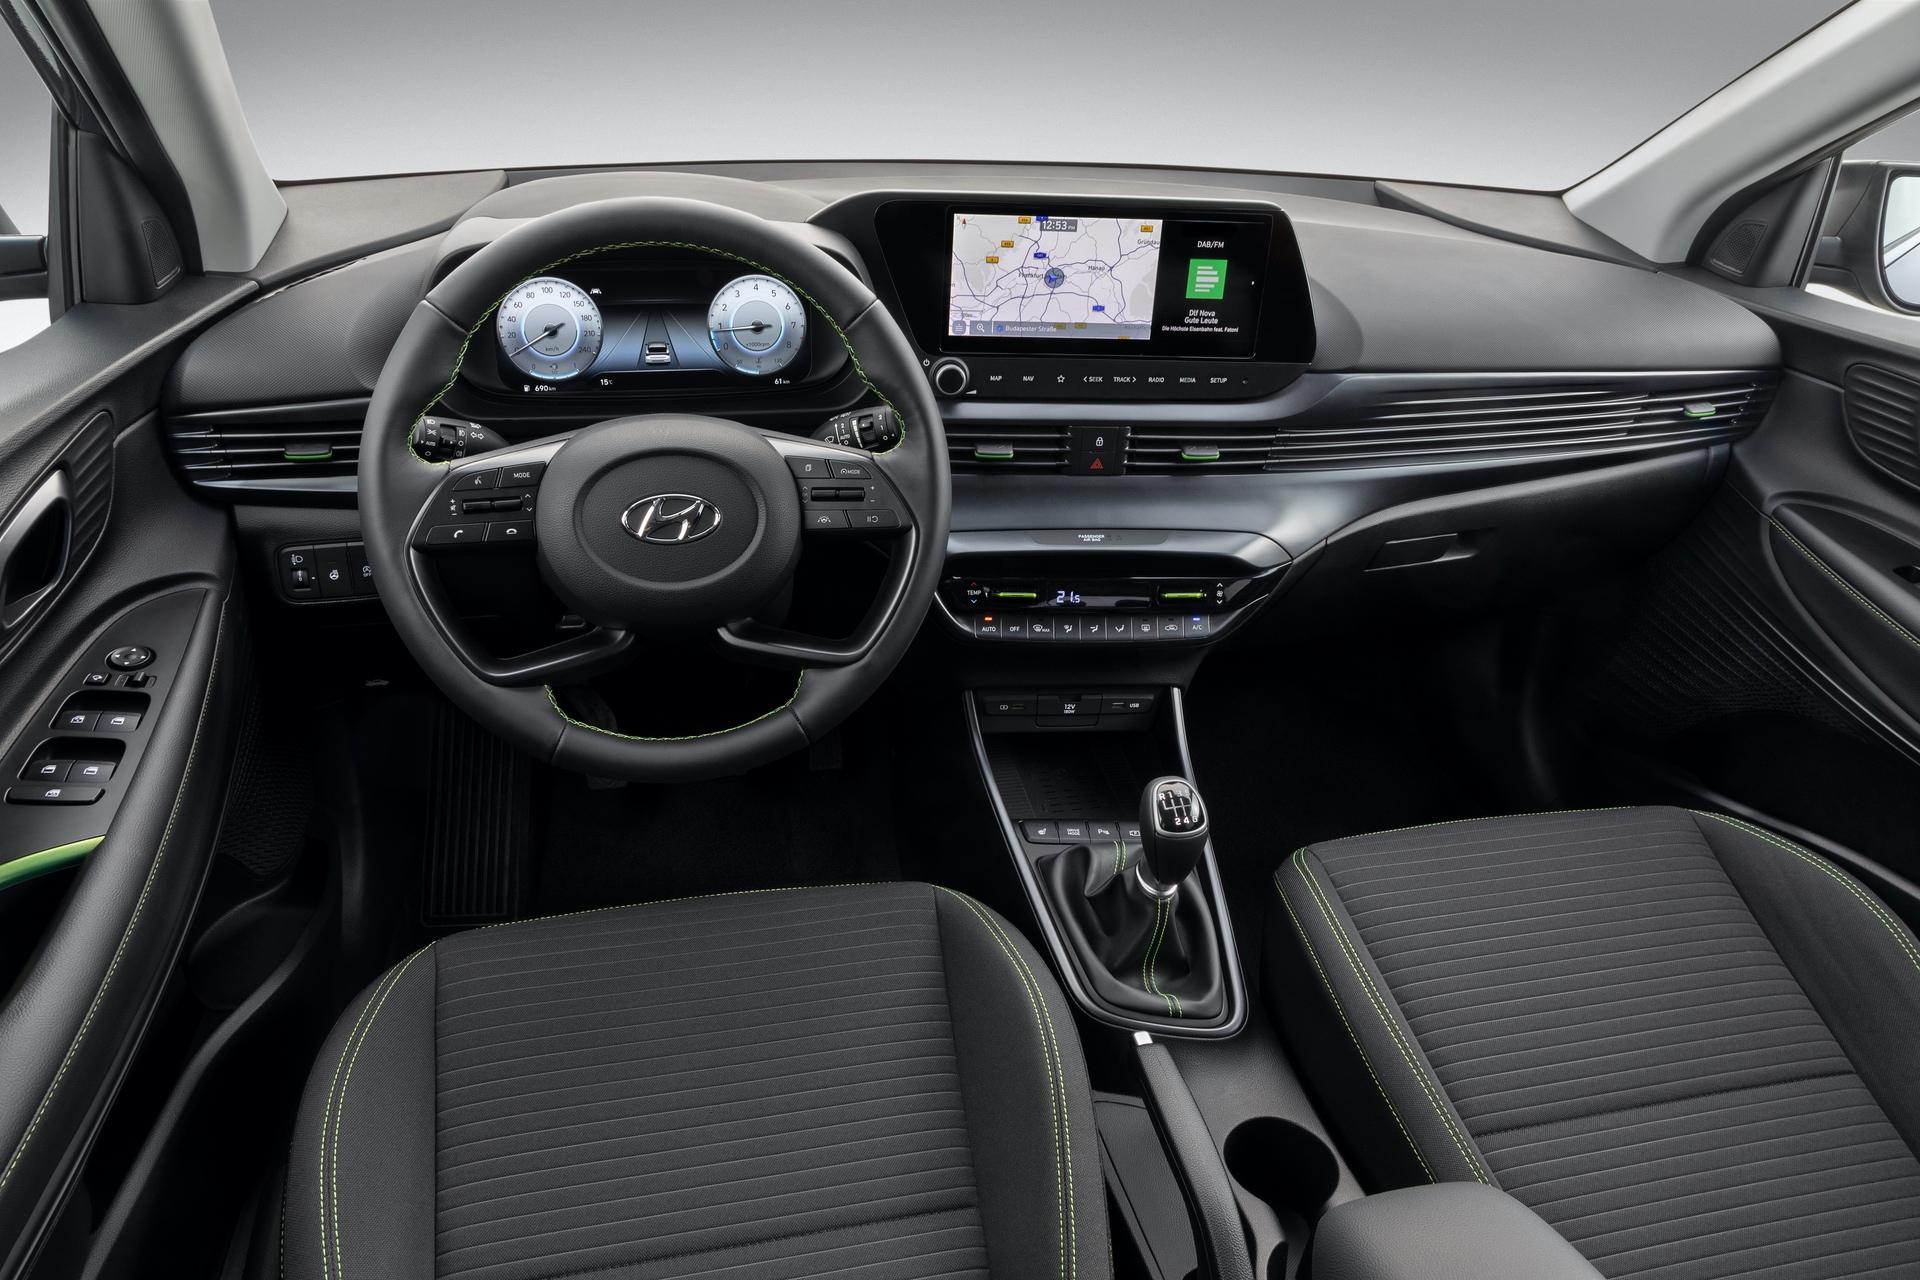 Hyundai_i20_interior_0003